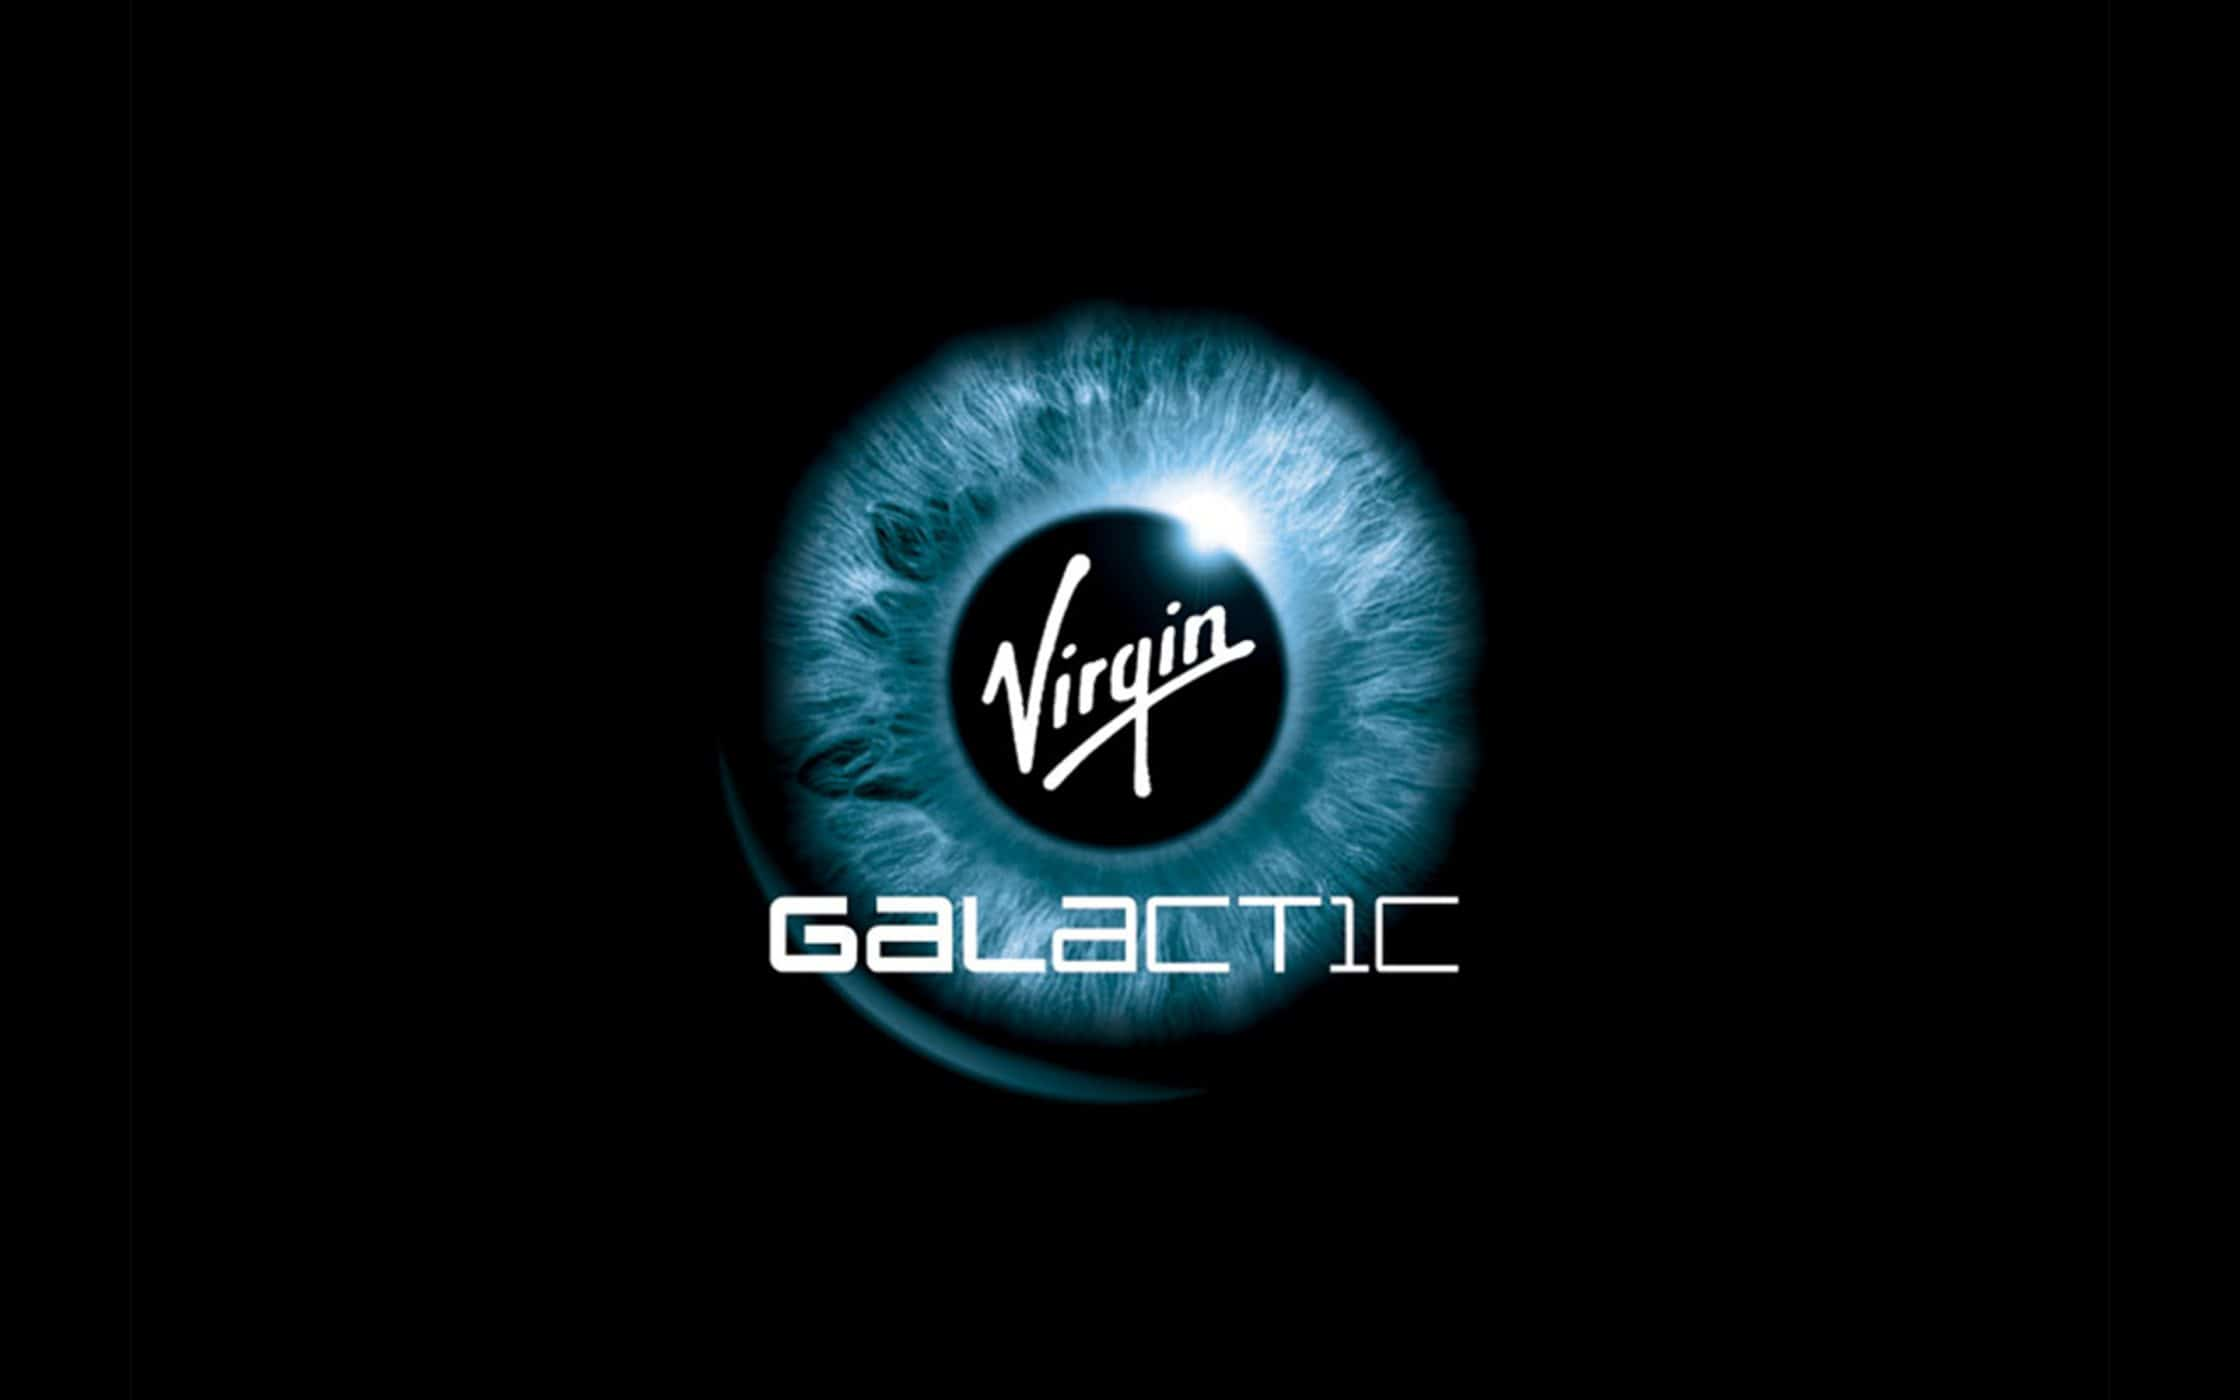 buy virgin galactic shares